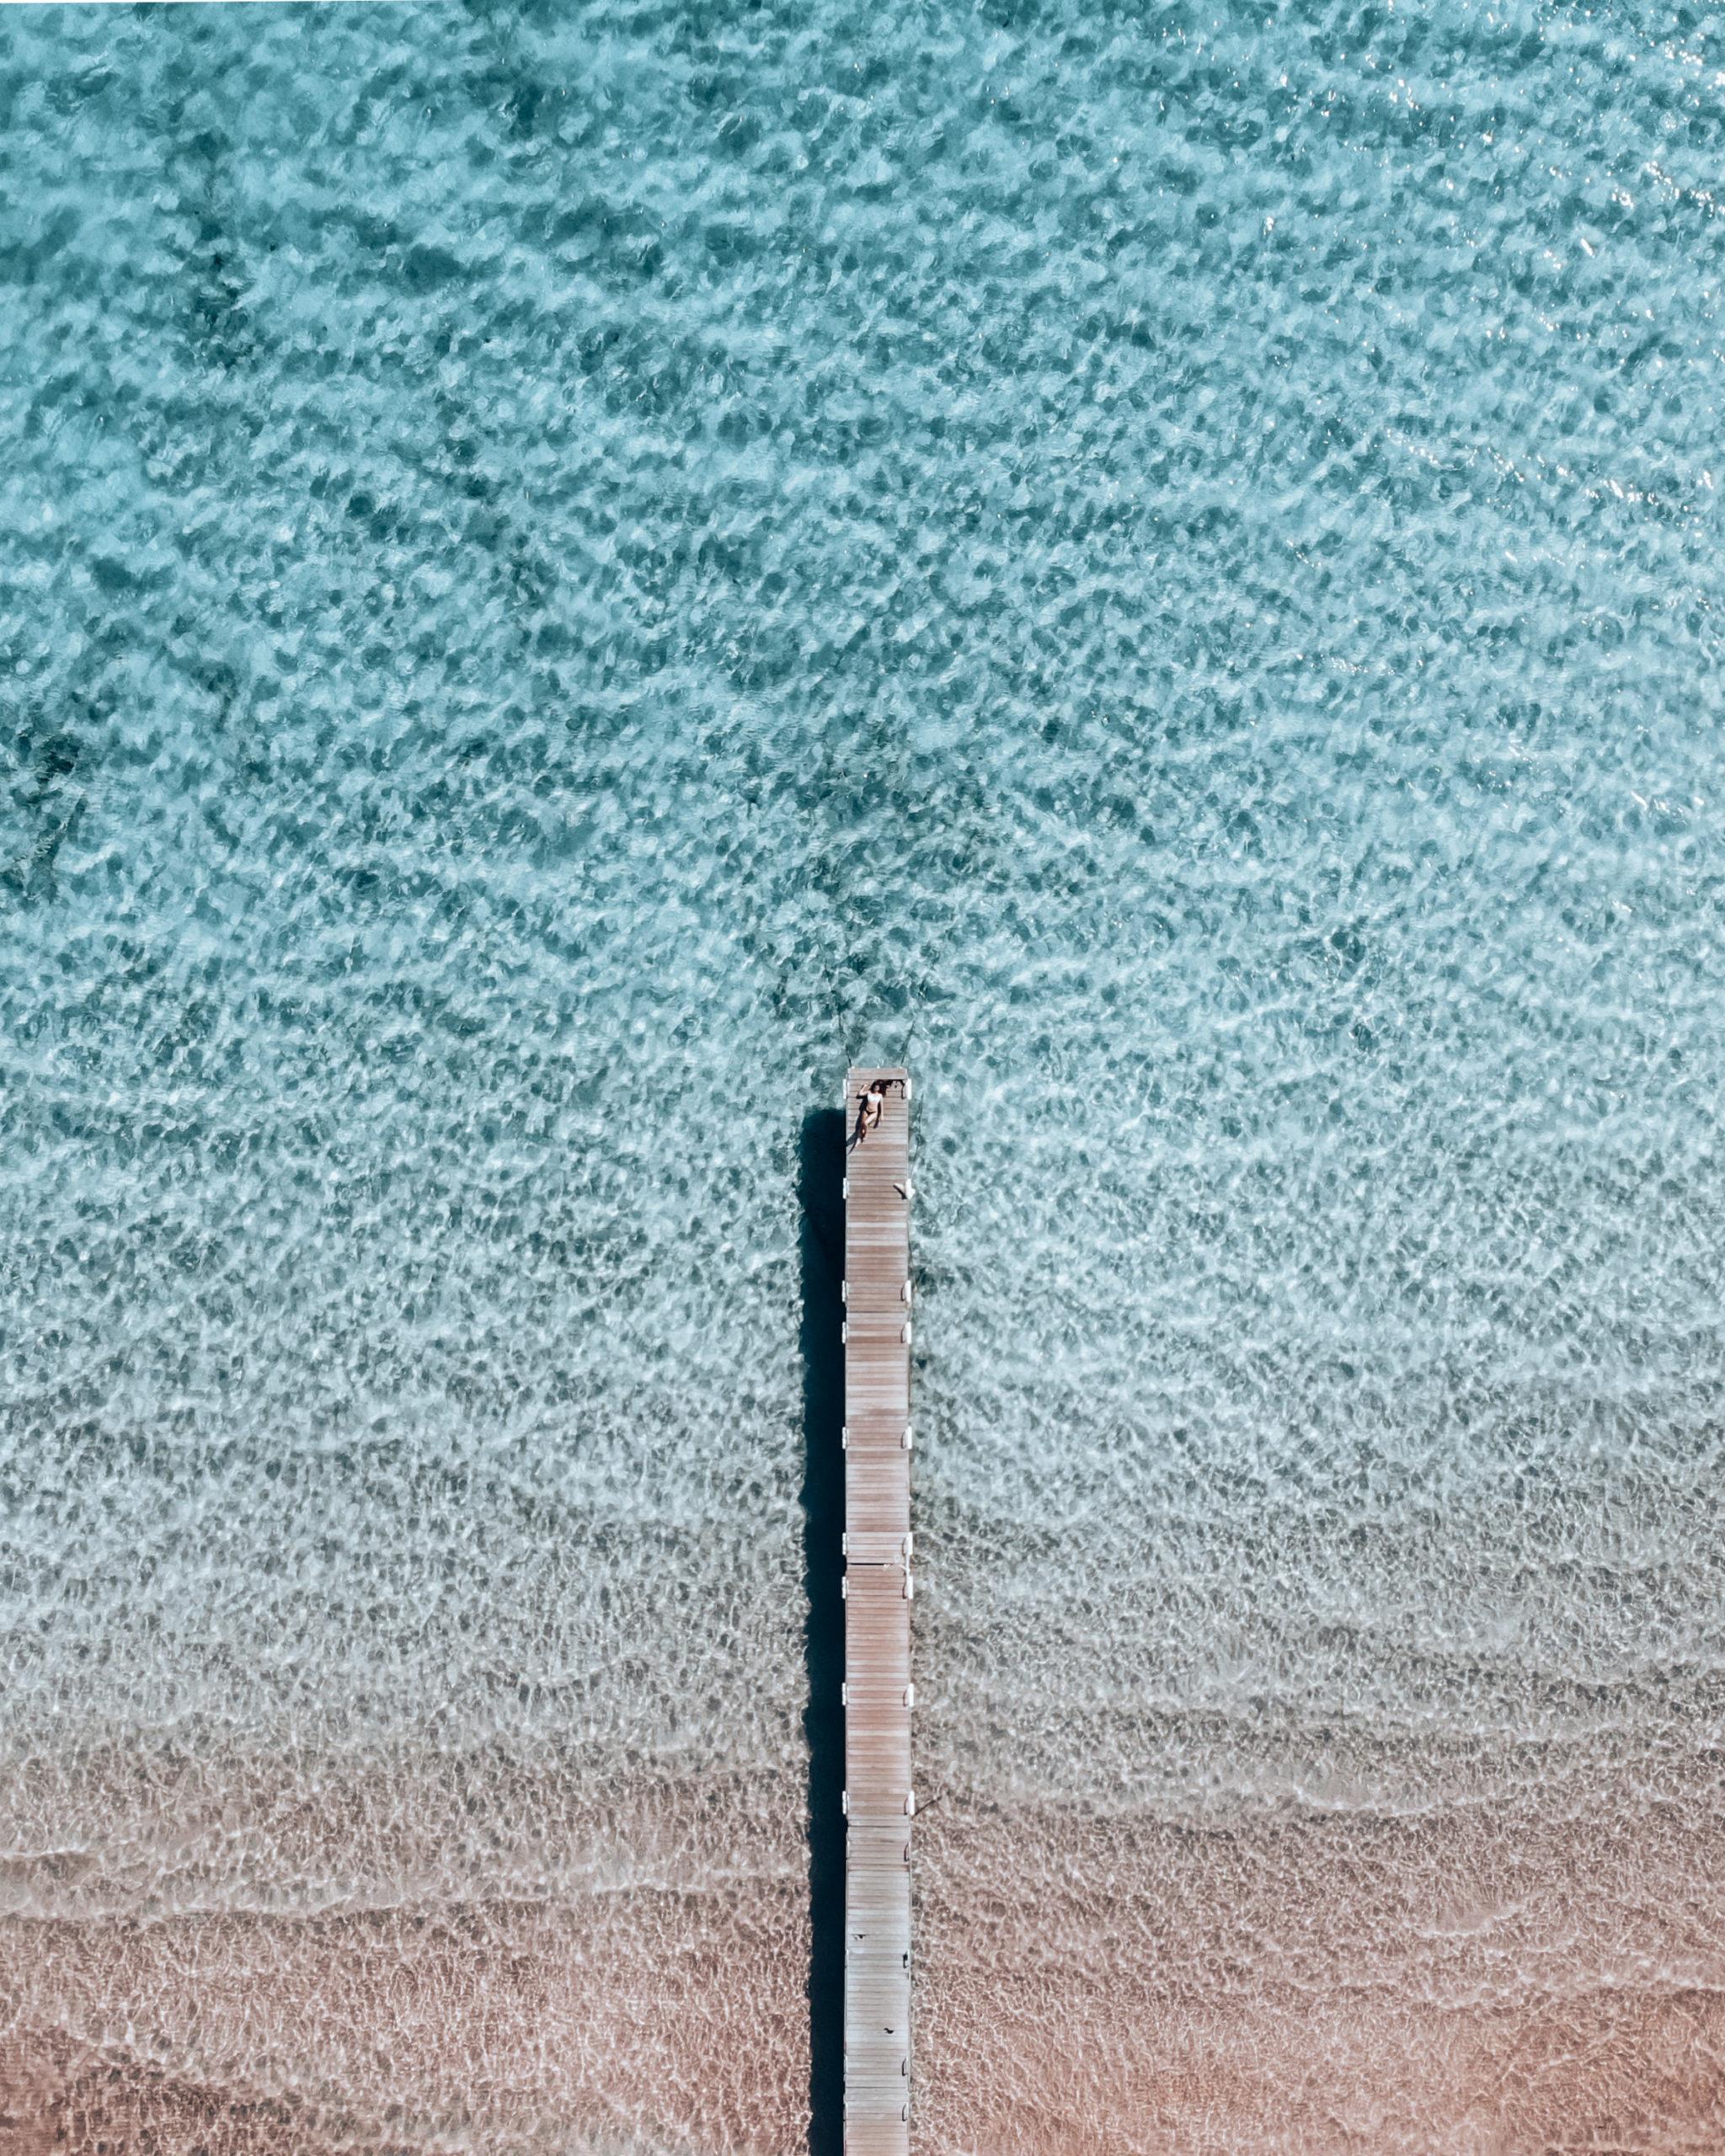 Rondinara plage corse du sud france